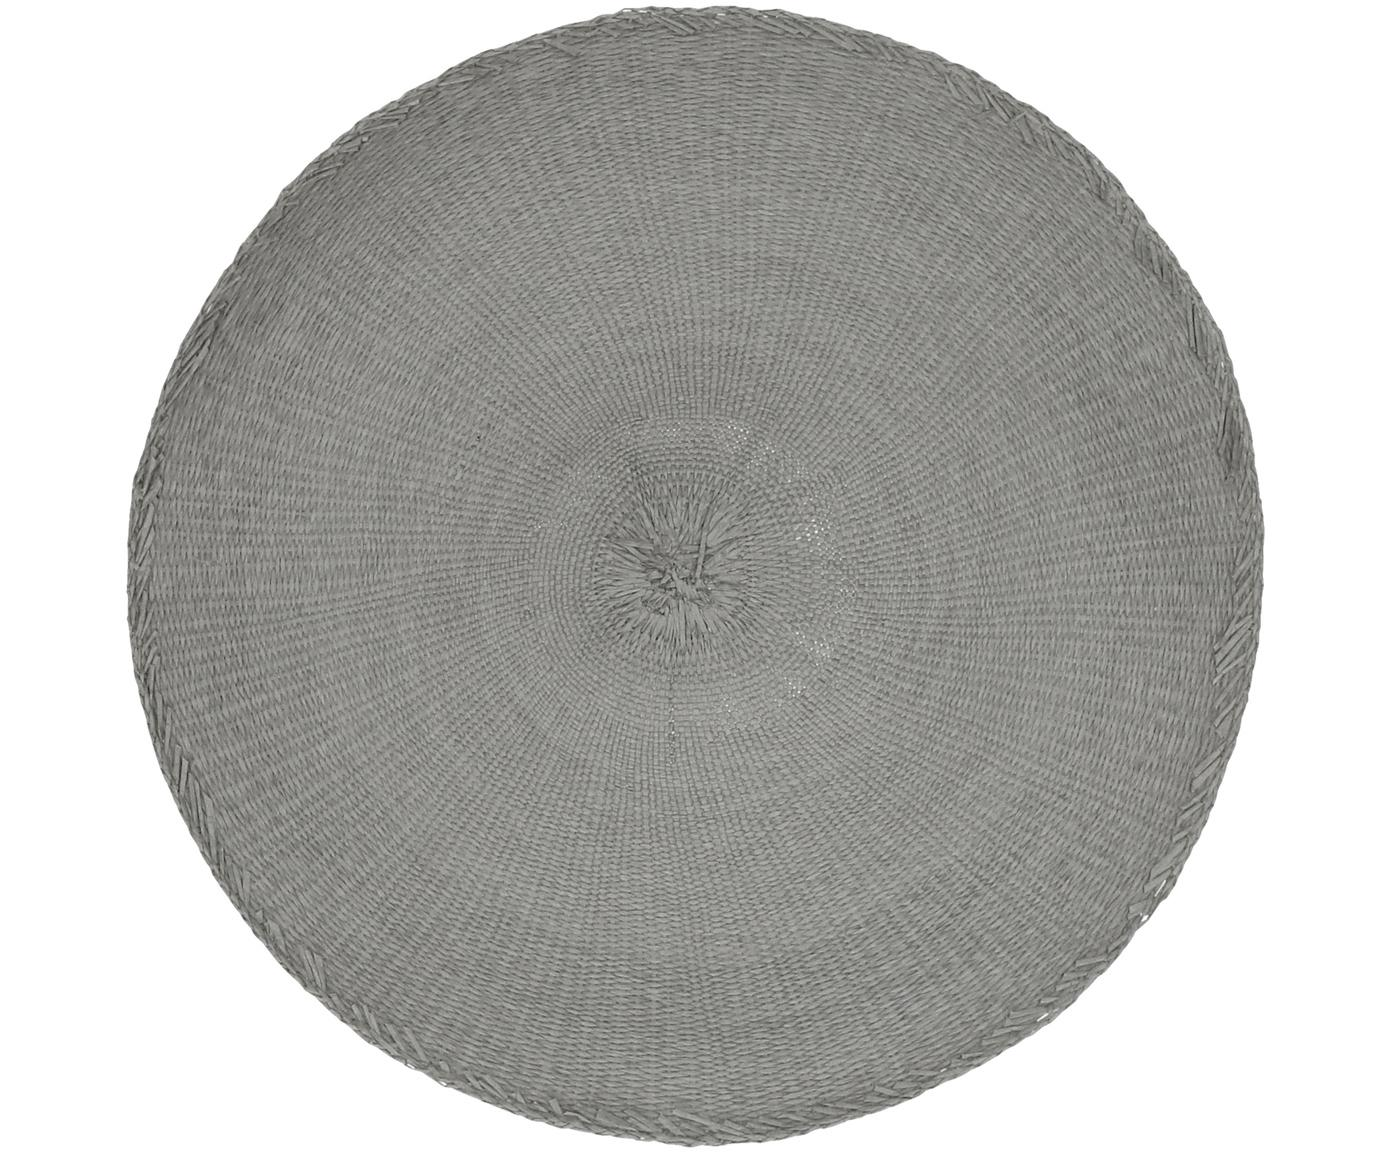 Ronde placemats Kolori, 2 stuks, Papiervezels, Grijs, Ø 38 cm